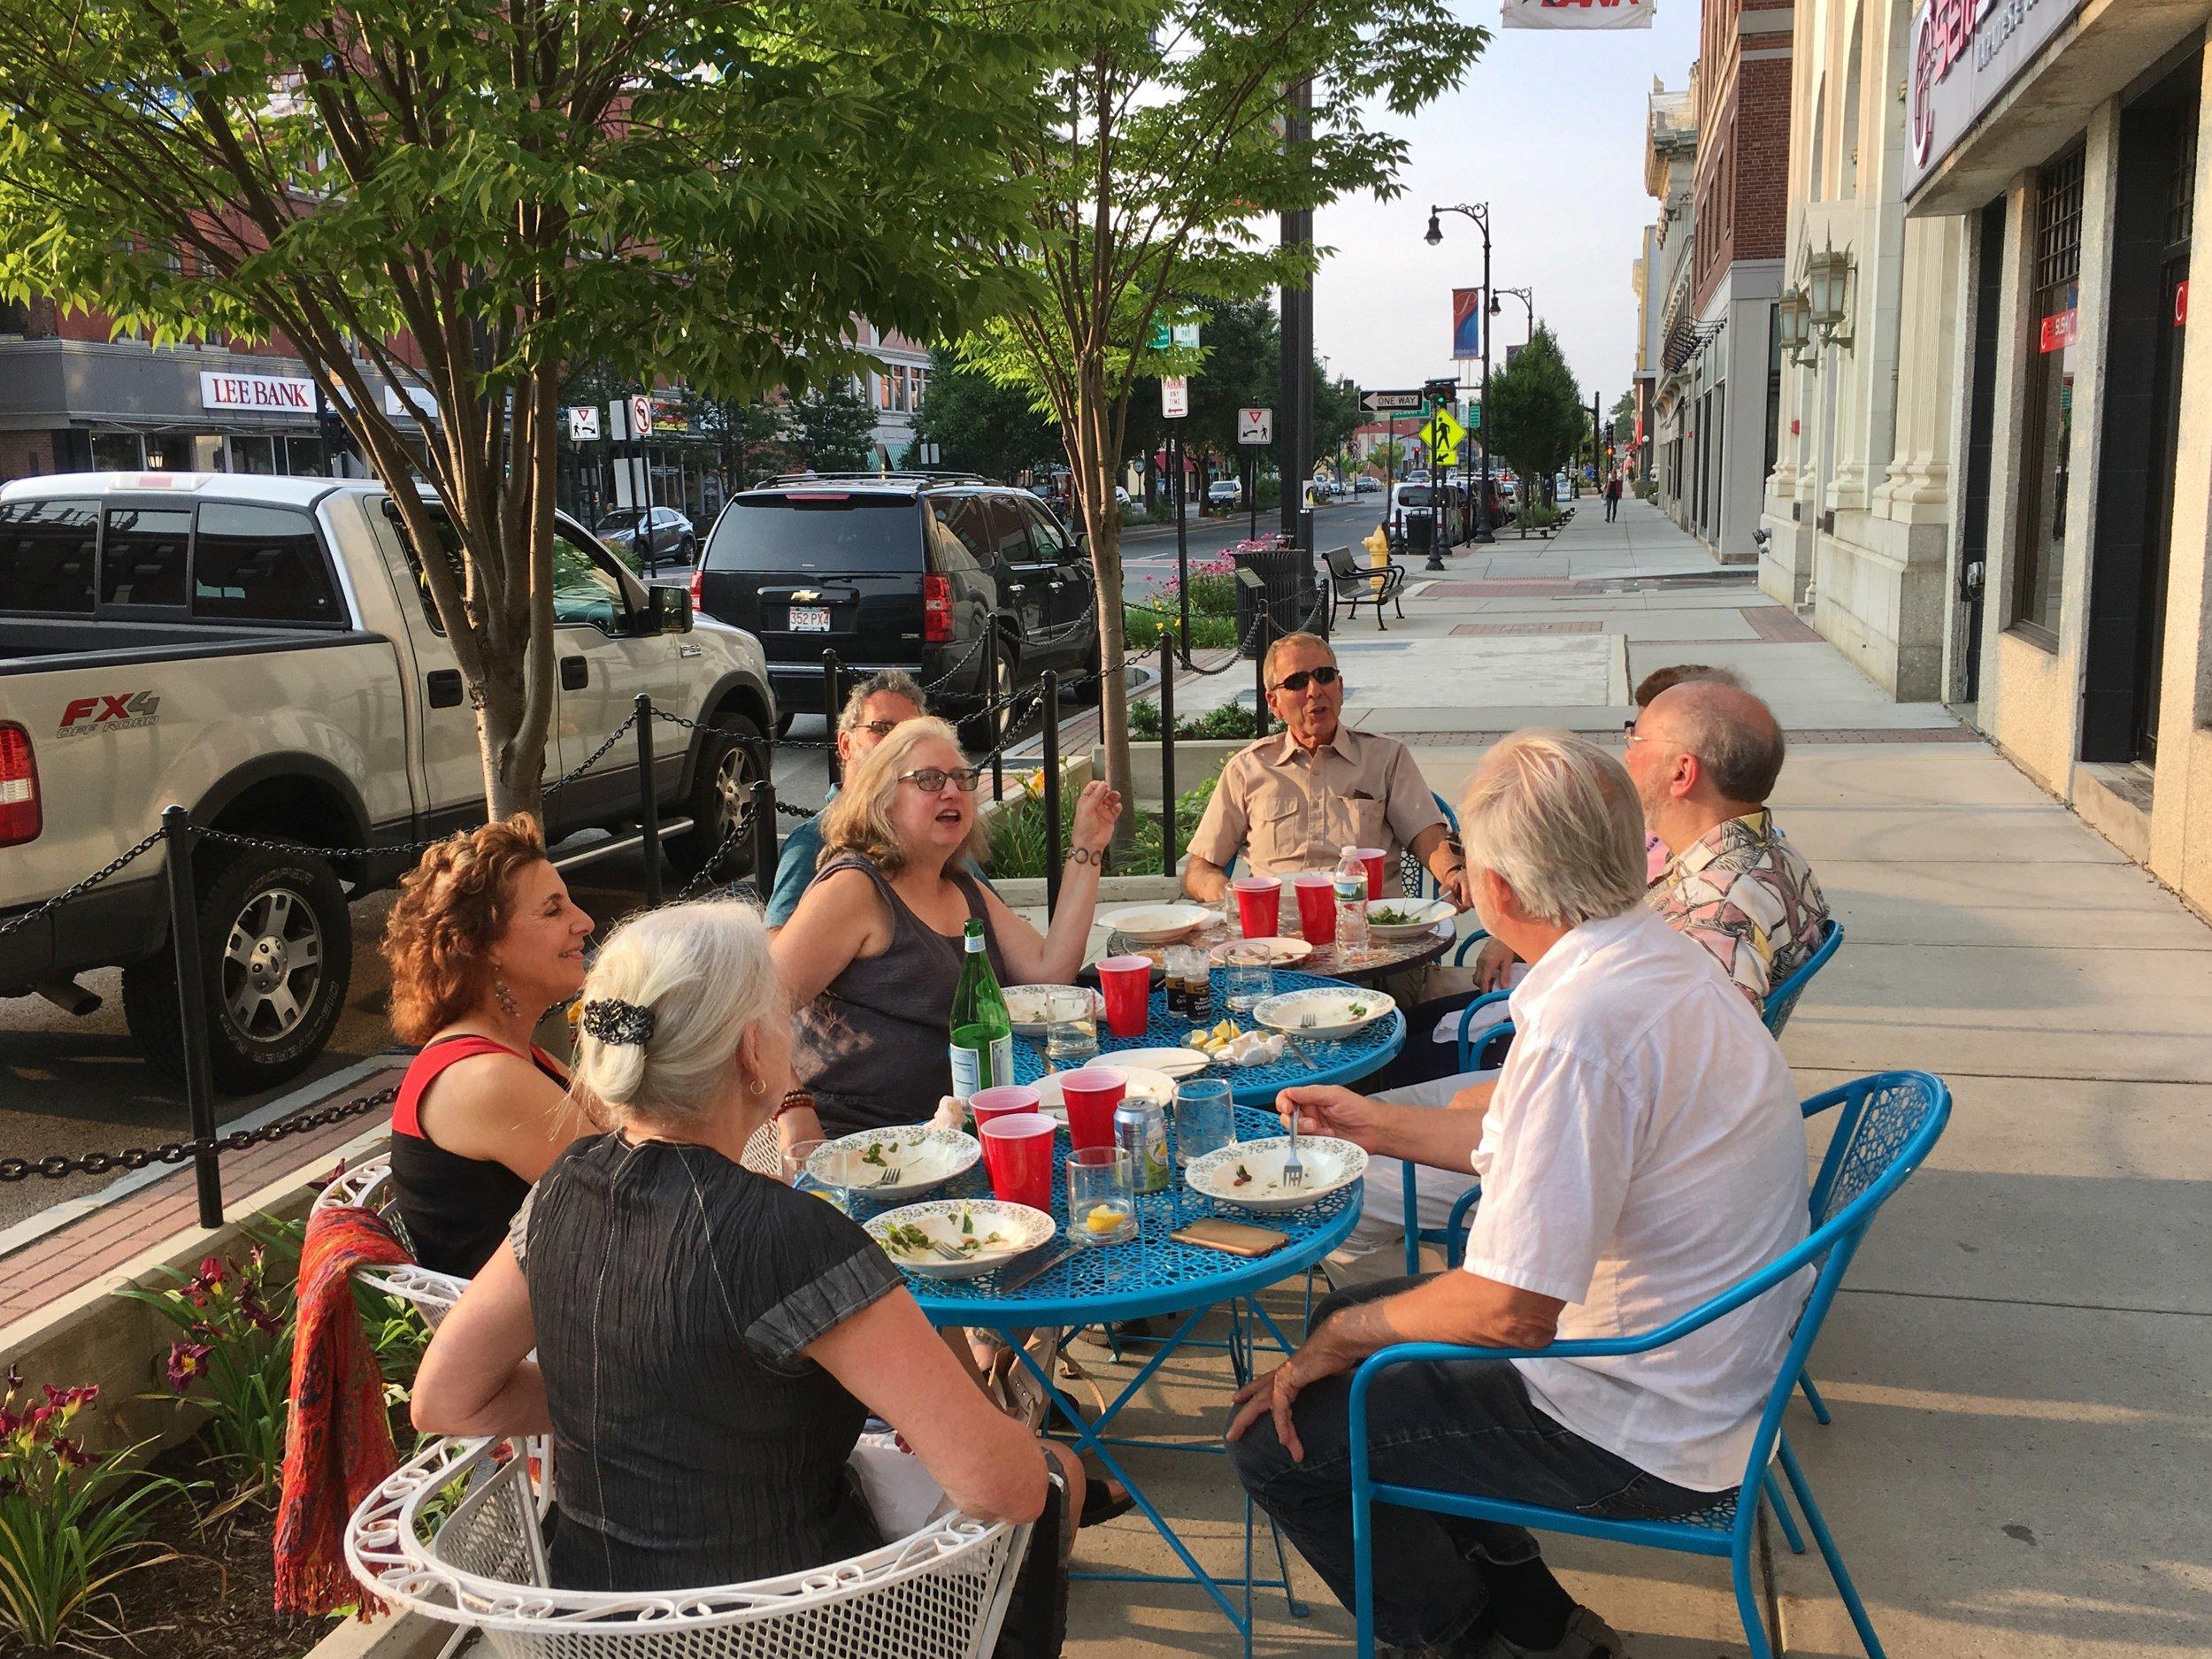 Sidewalk dining outside of Brooklyn's Best on North Street.